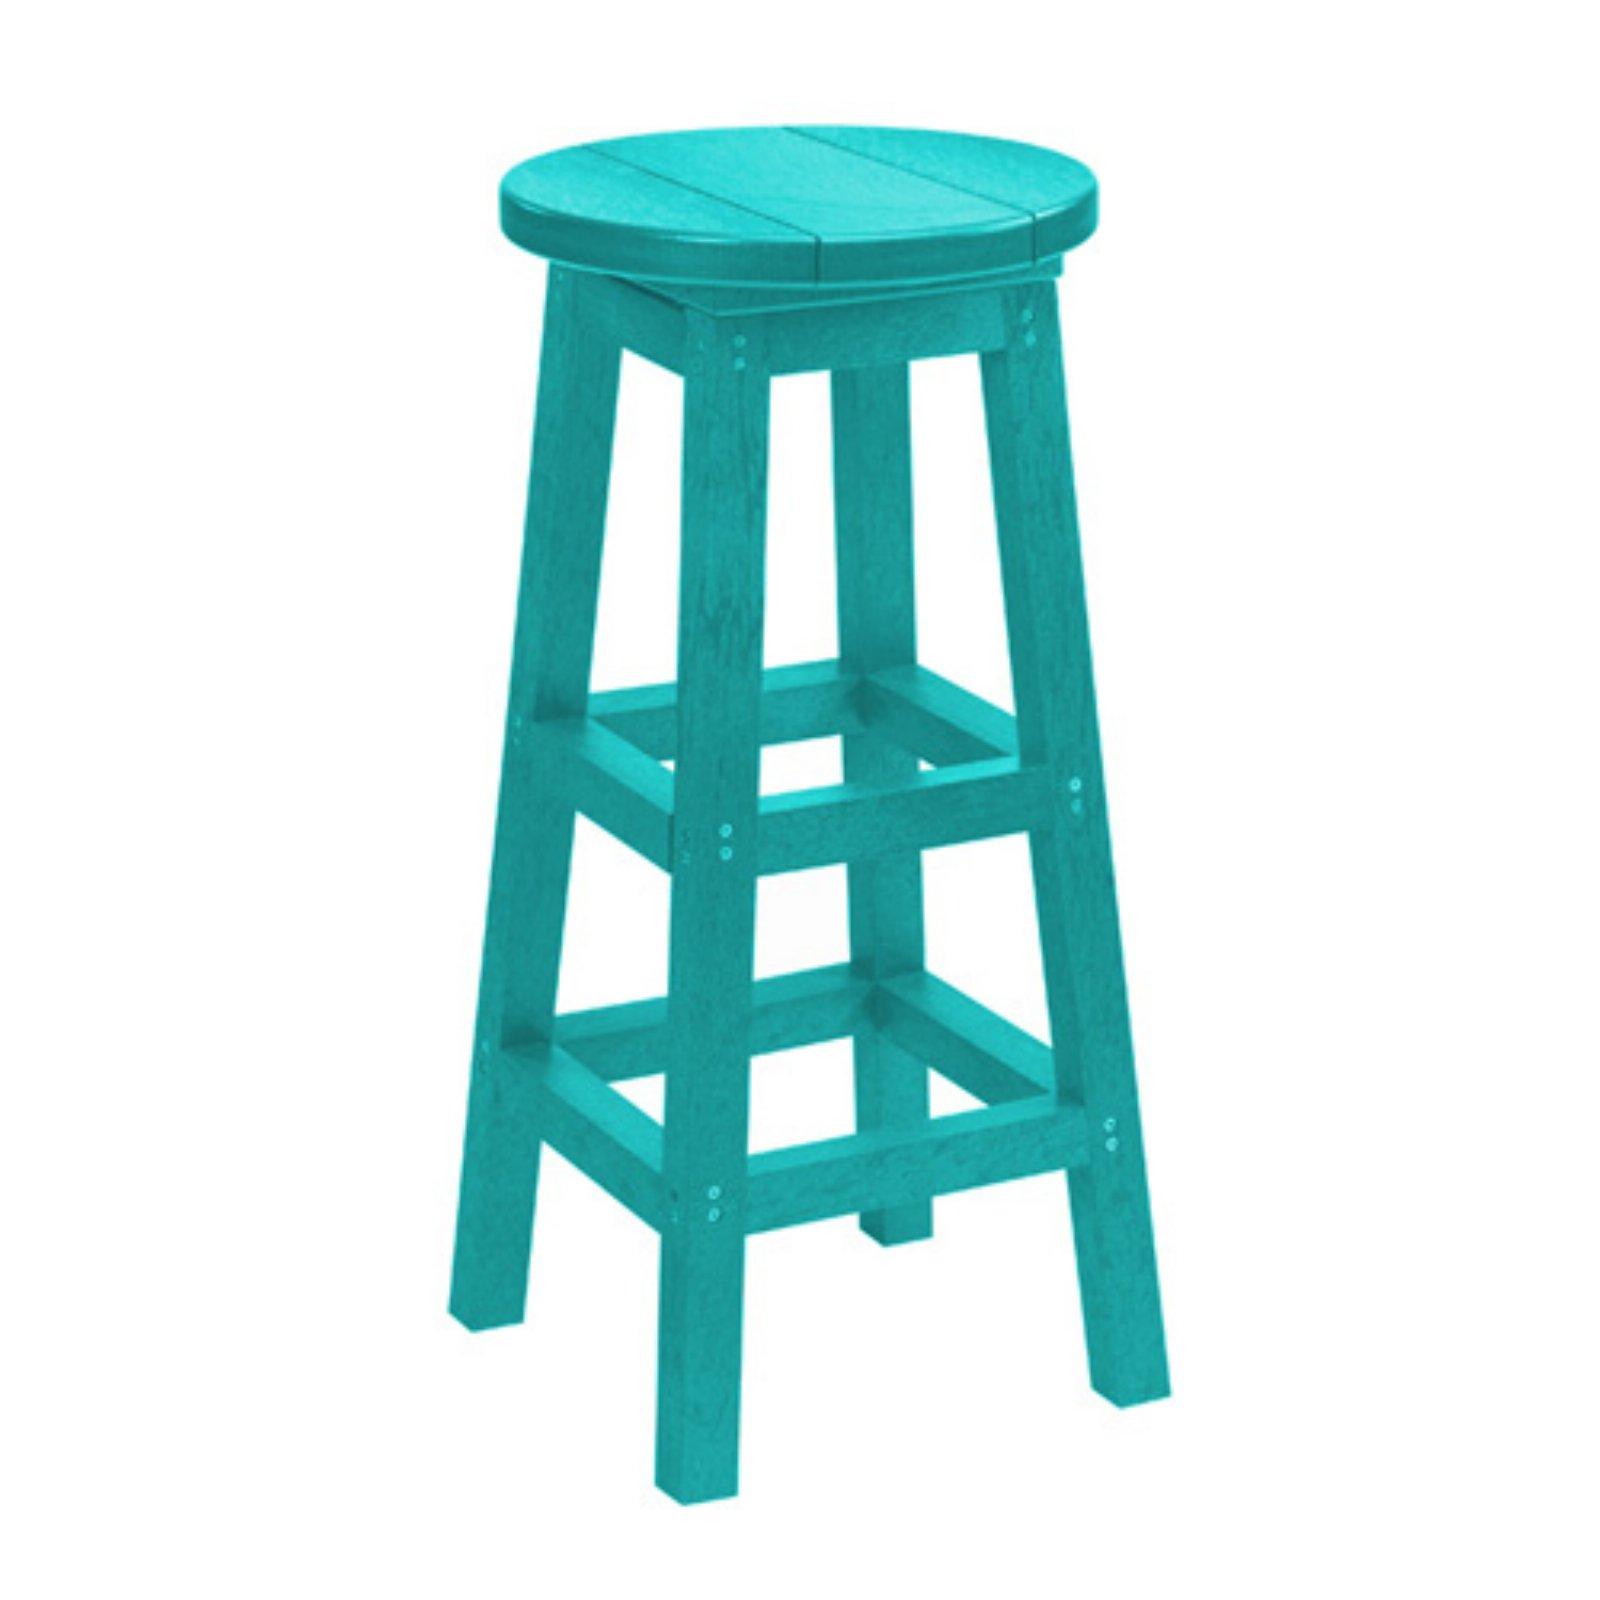 C R Plastic Generations Swivel Bar Stool Turquoise Bar Stools